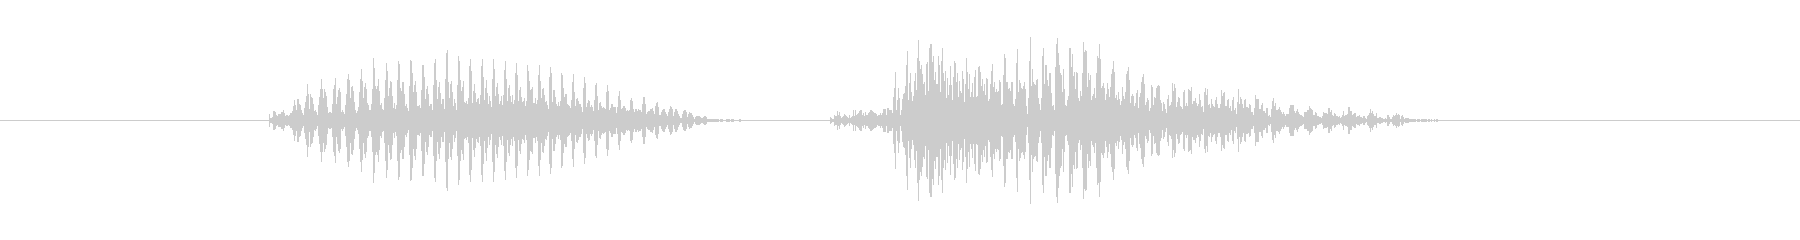 PK(ぴーけー)の未再生の波形